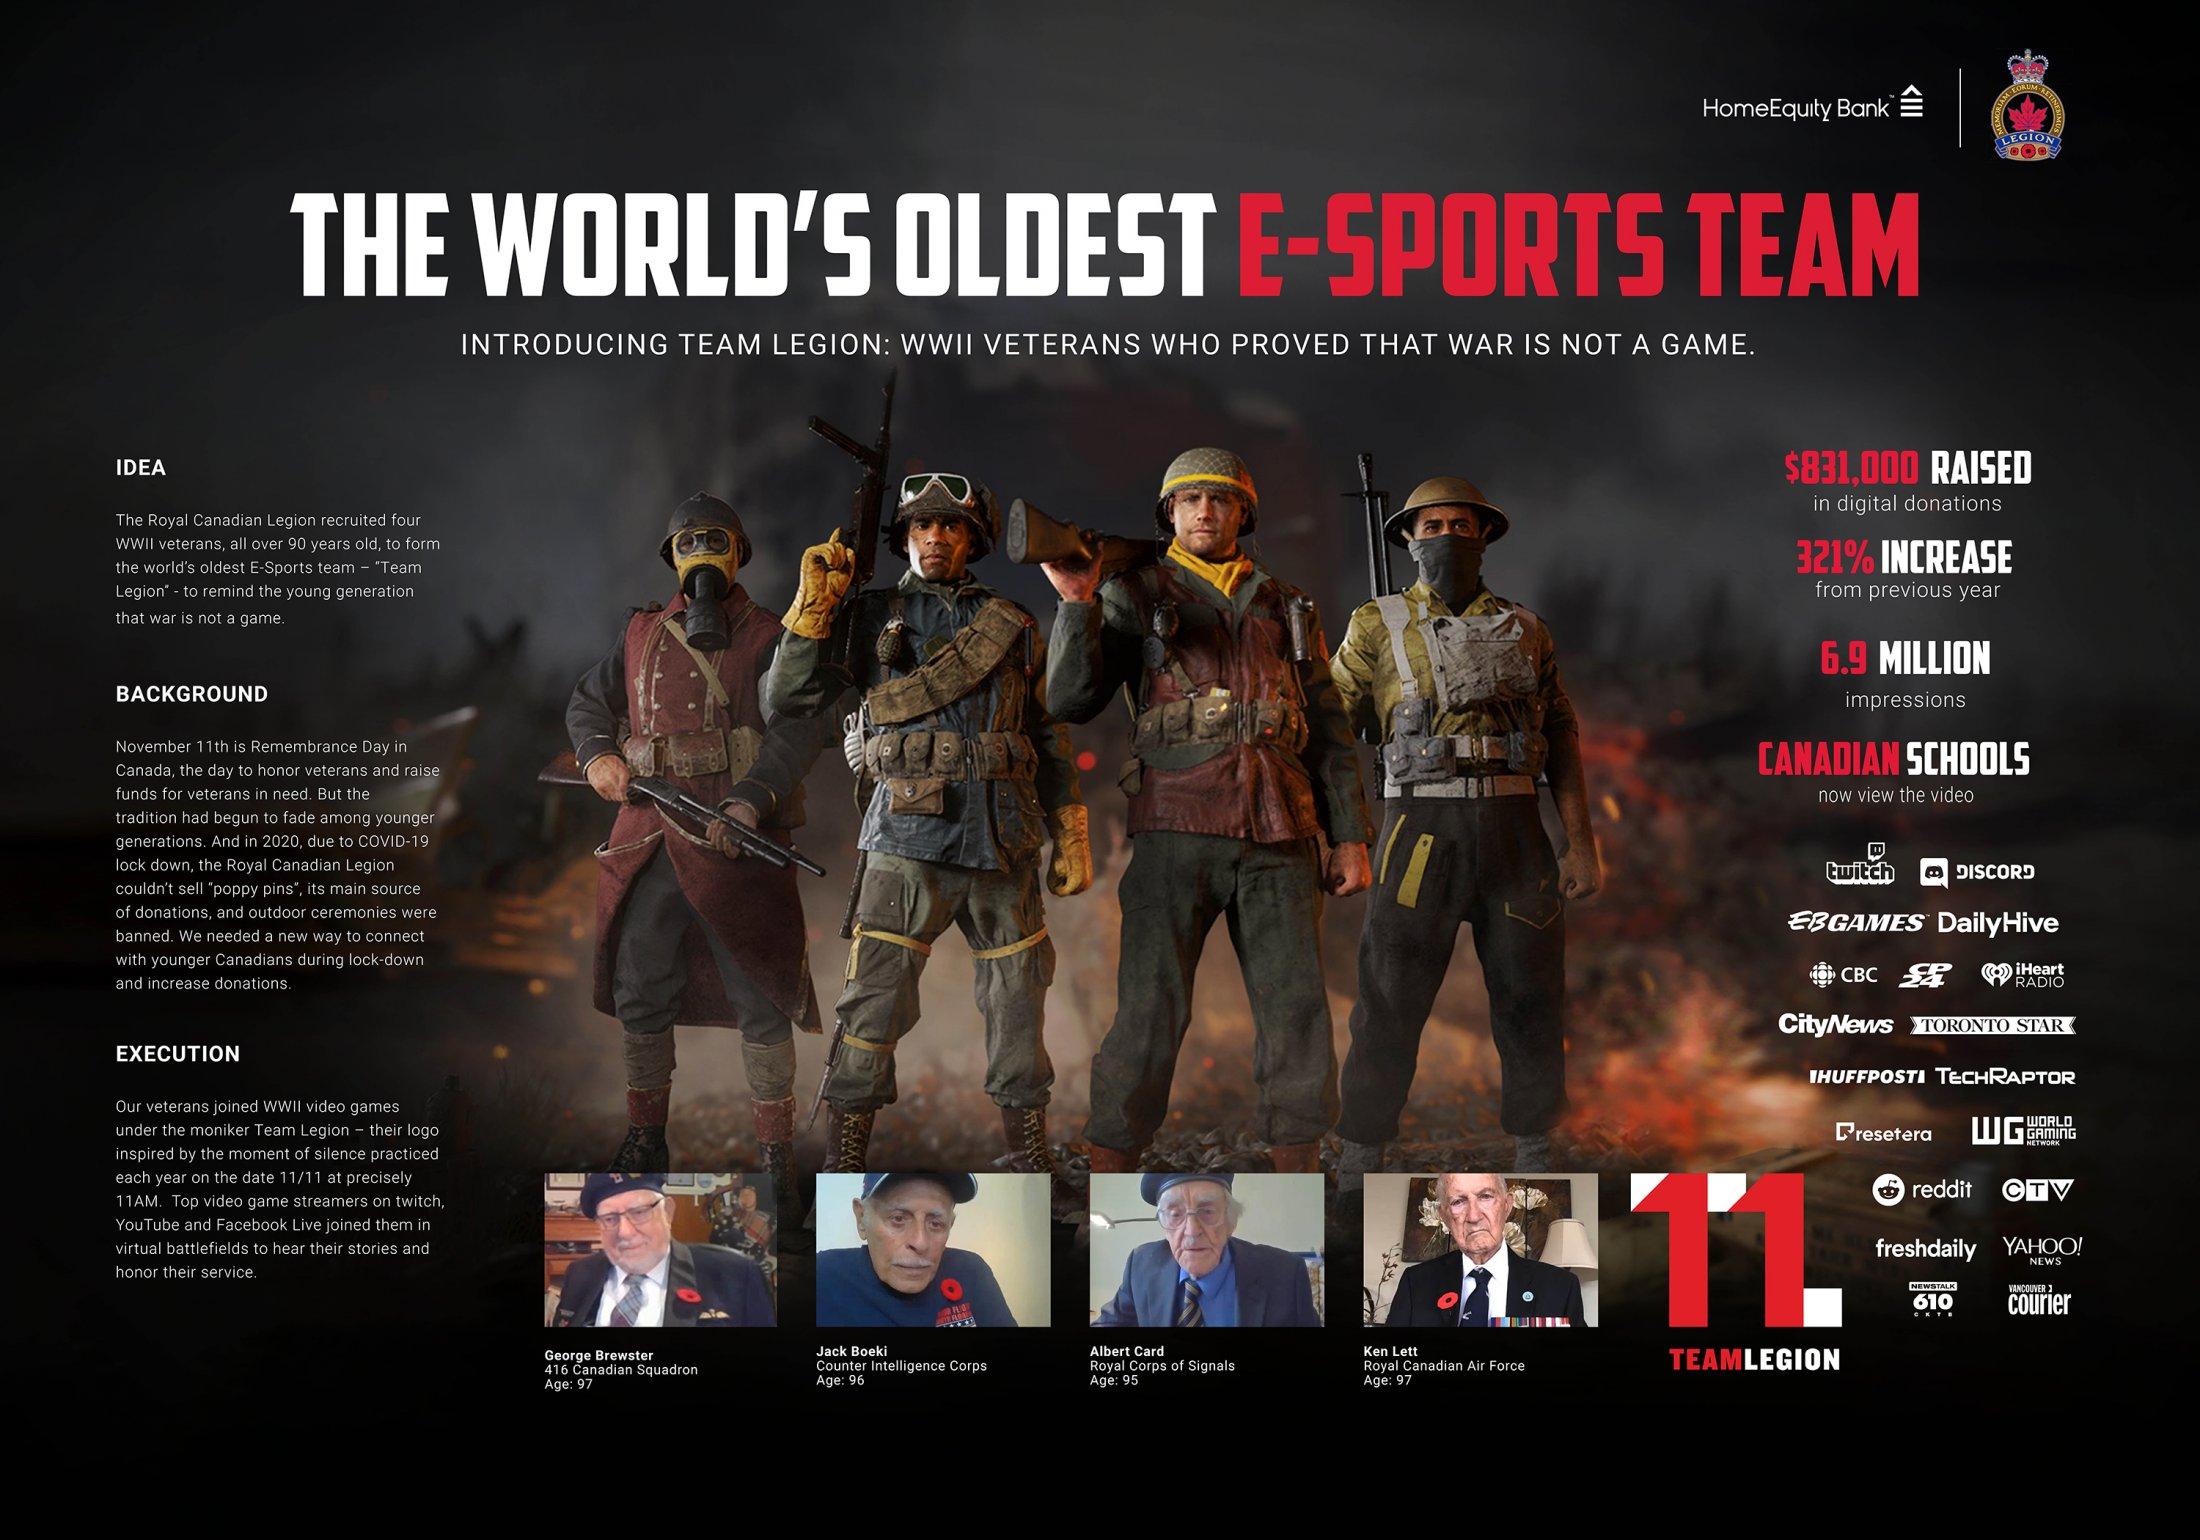 Thumbnail for World's Oldest e-Sports Team